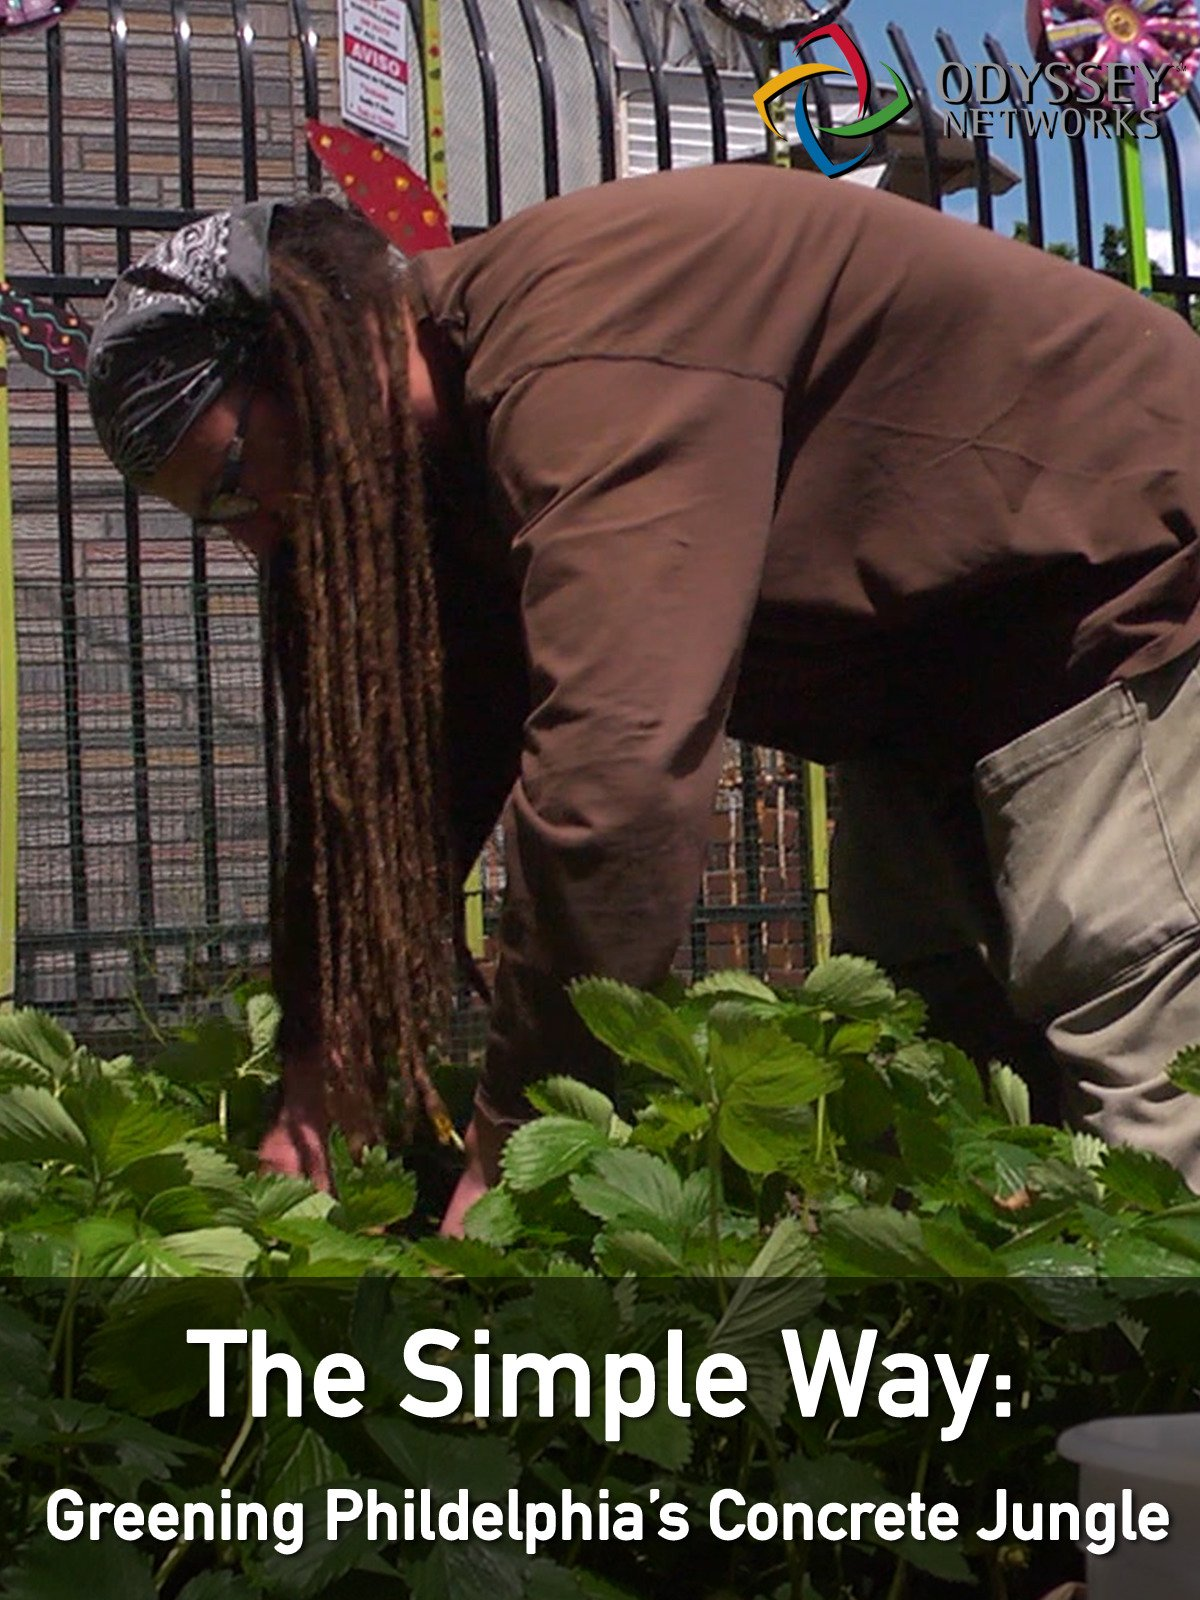 Clip: The Simple Way: The Greening of Philadelphia's Concrete Jungle